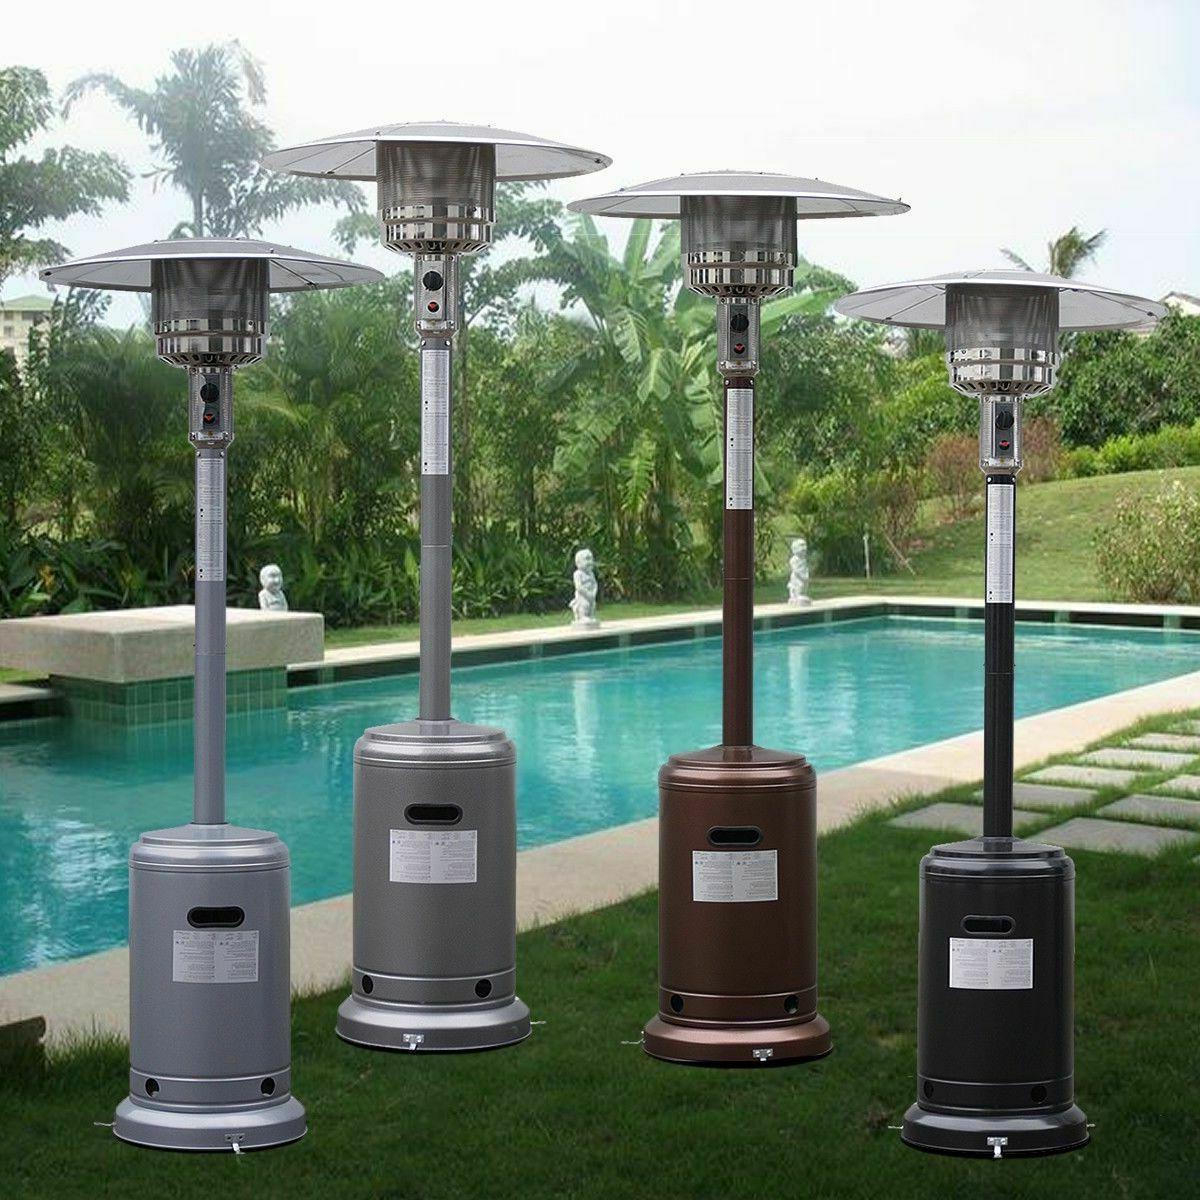 New Outdoor Heater LP Gas Steel w/accessories